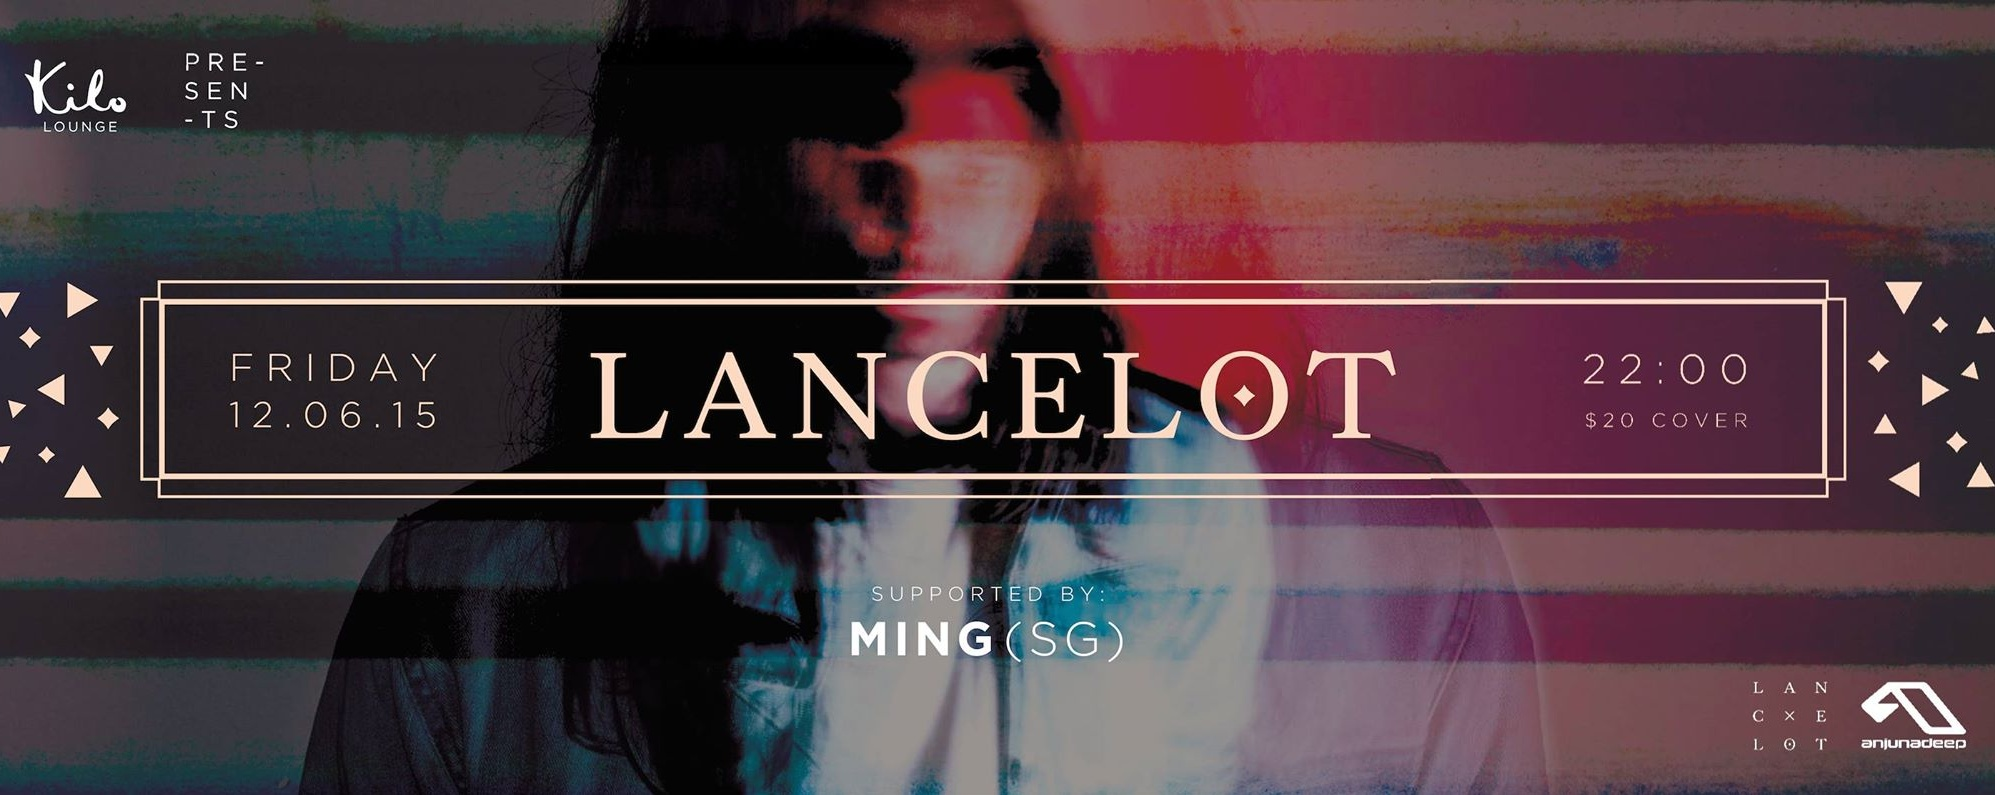 Kilo Lounge presents Lancelot